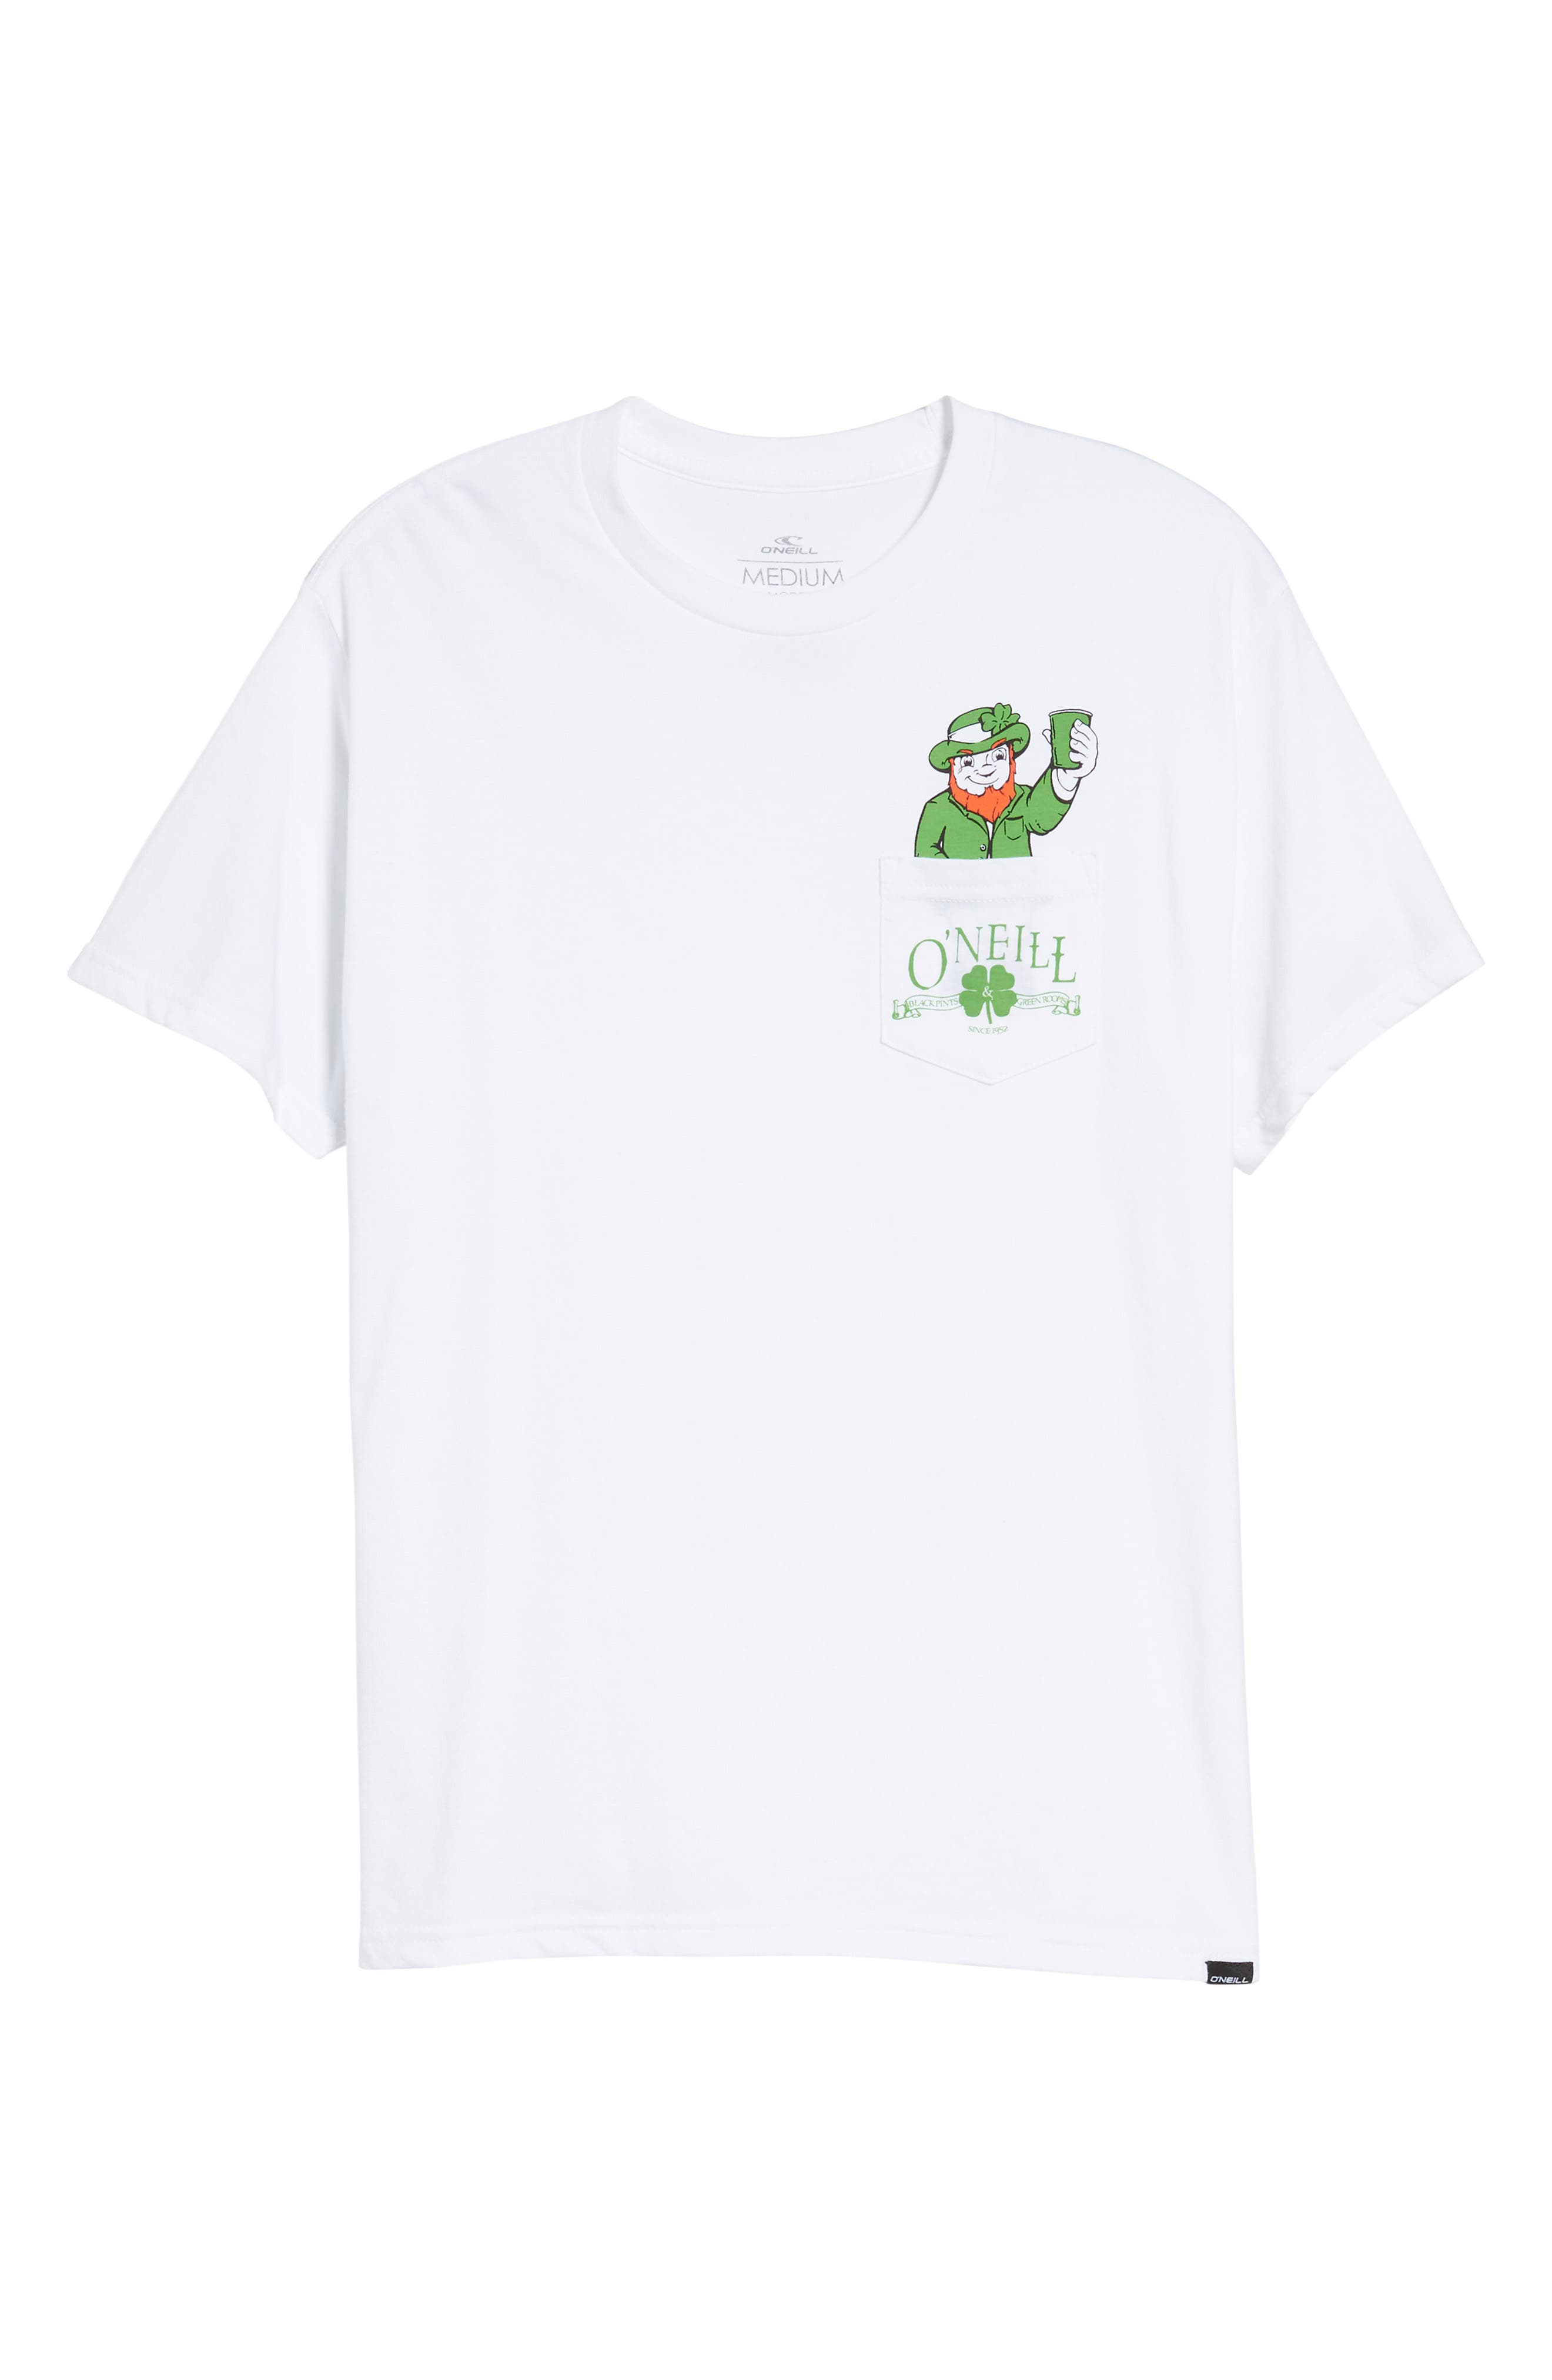 Shinanigans Graphic T-Shirt,                             Alternate thumbnail 6, color,                             White